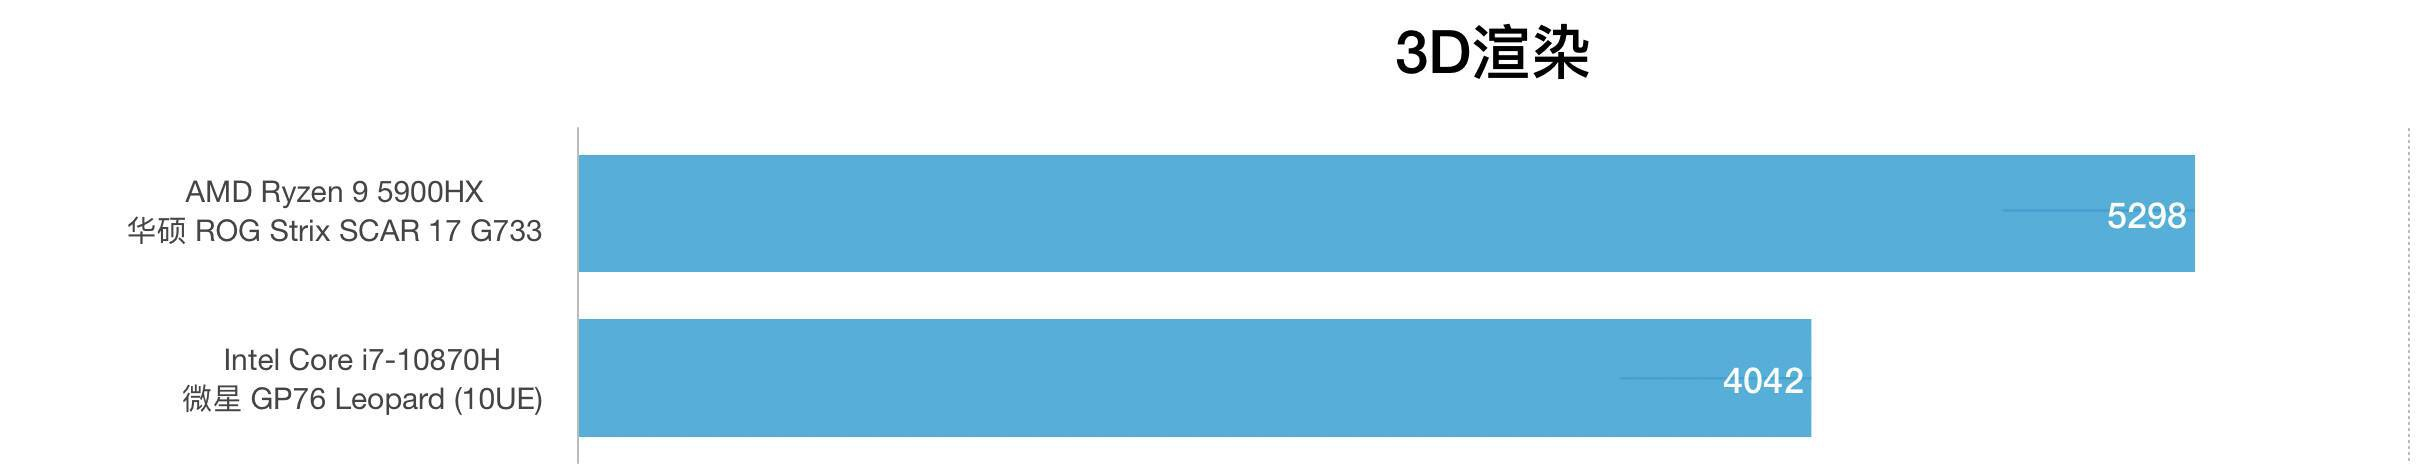 AMD锐龙R9 5900HX和i7-10870H性能跑分对比评测